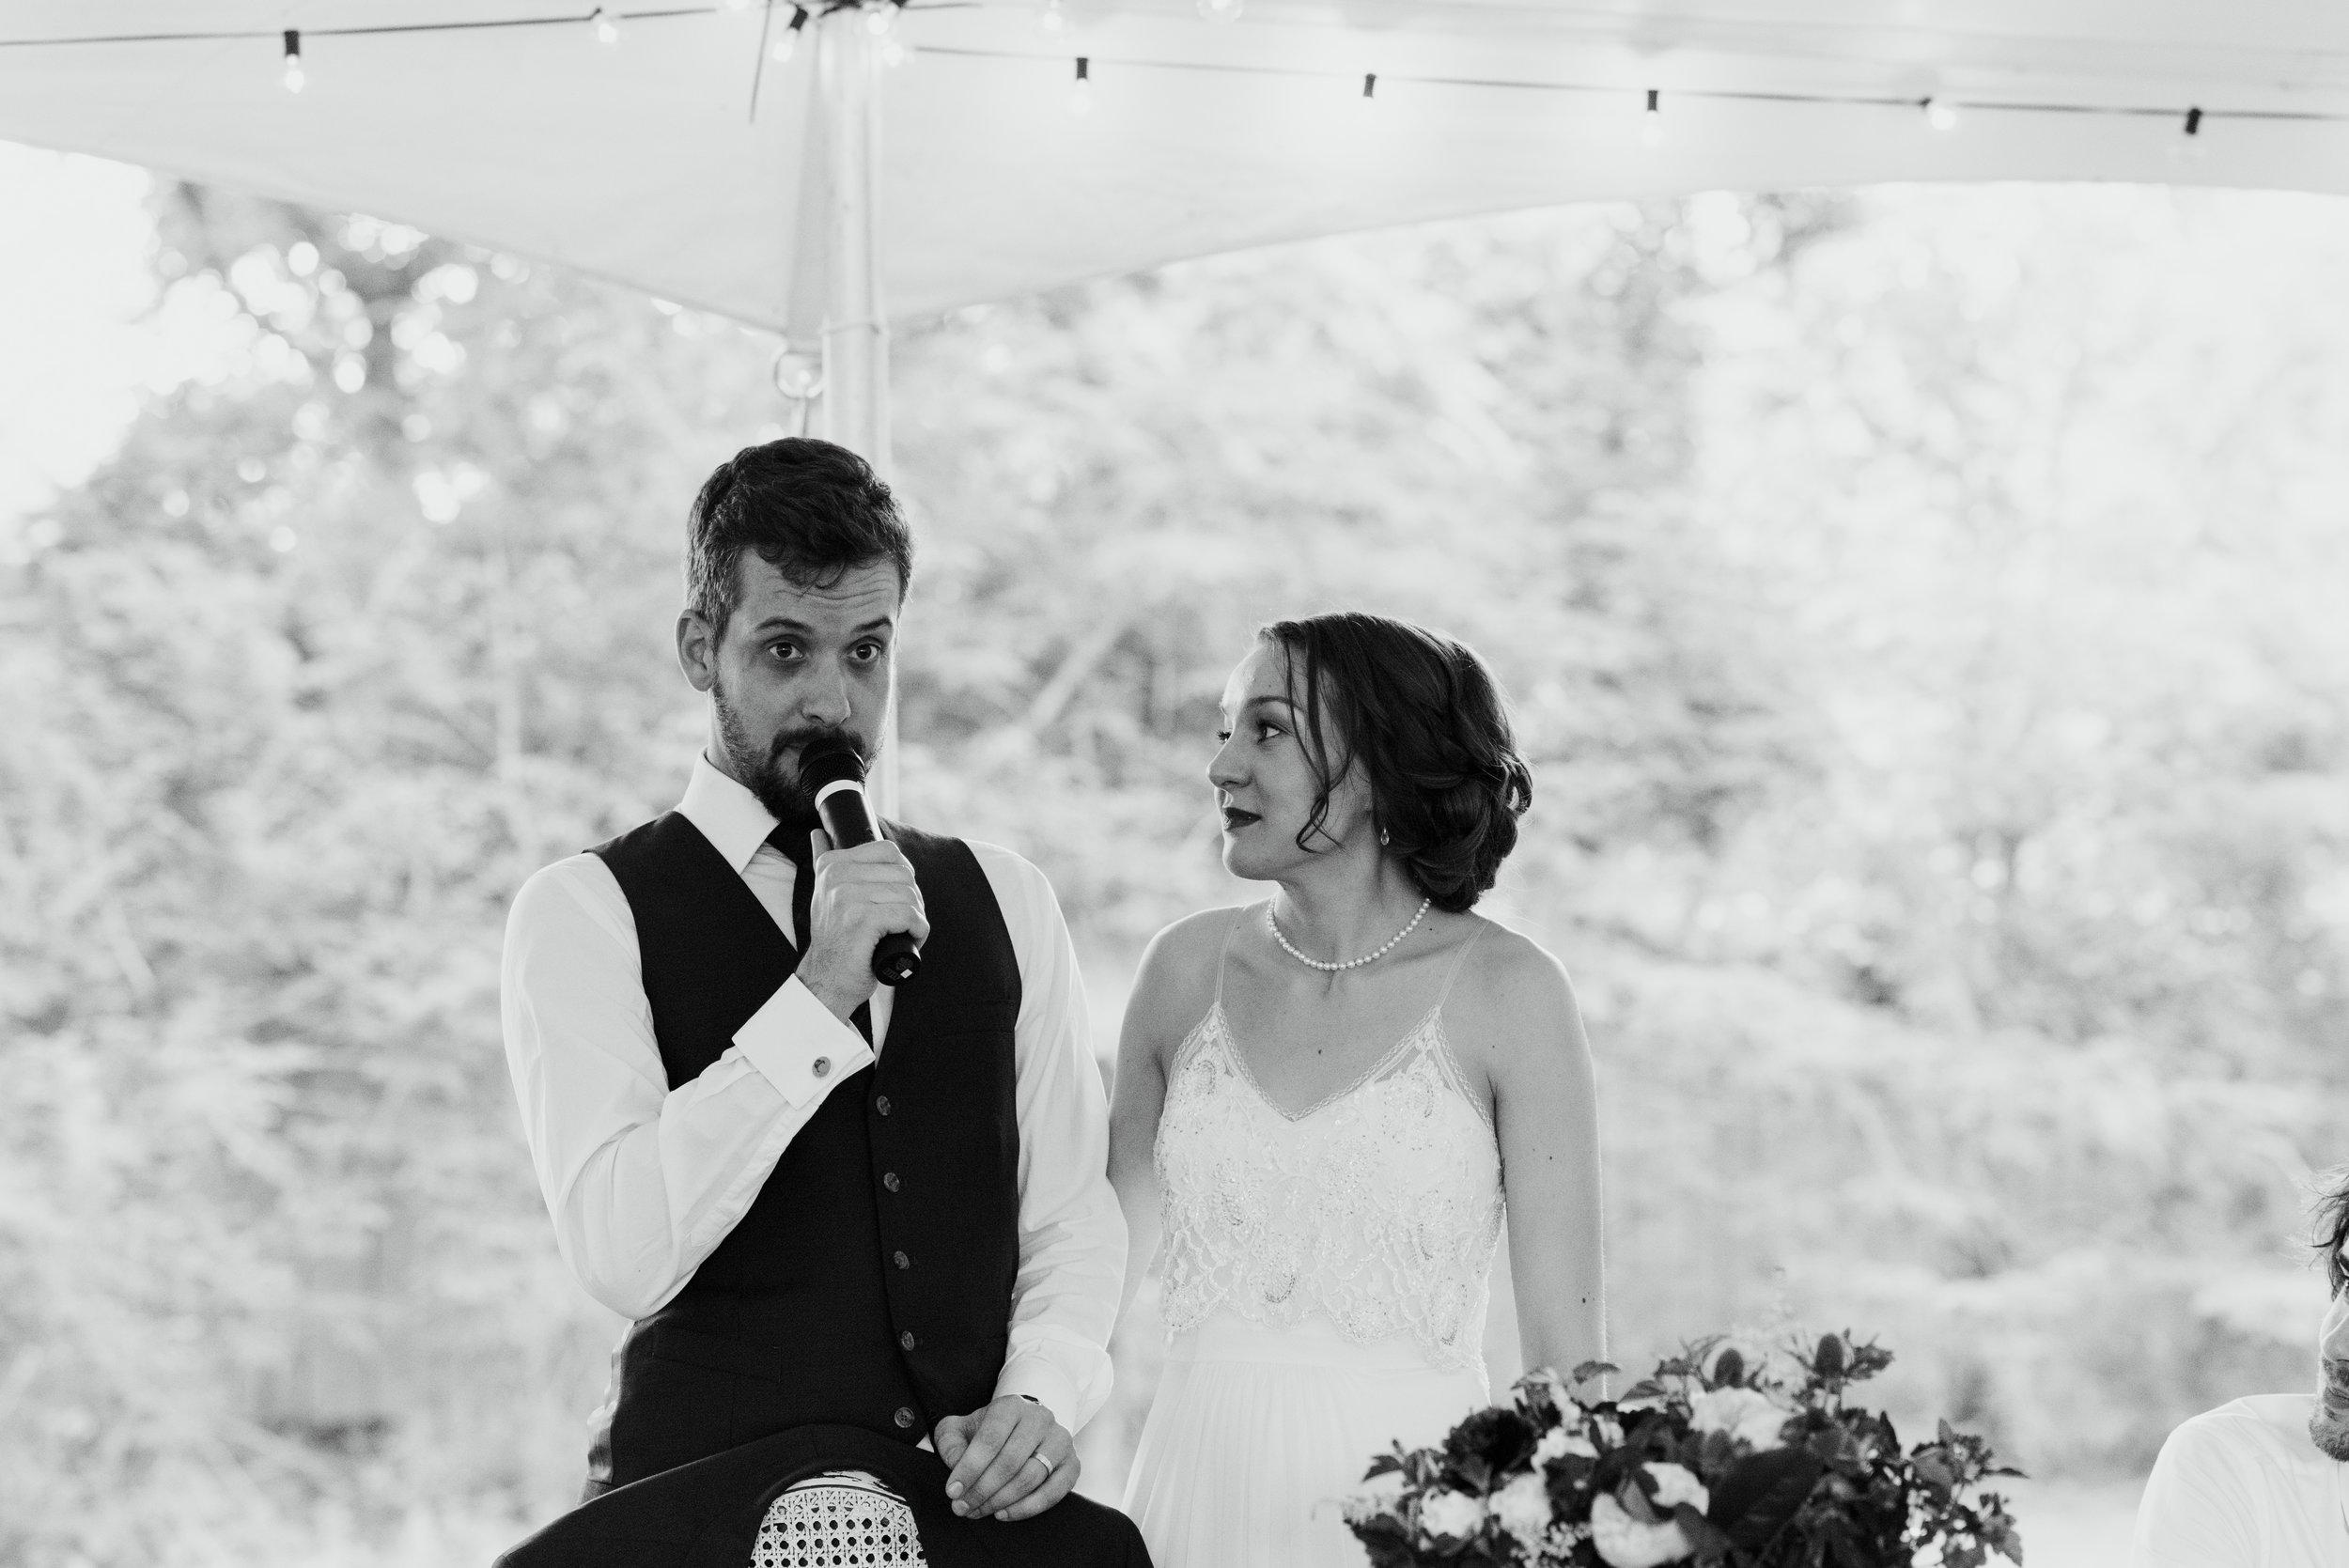 lauren-and-tim-north-carolina-wedding-meg-hill-photo- (1075 of 1087).jpg